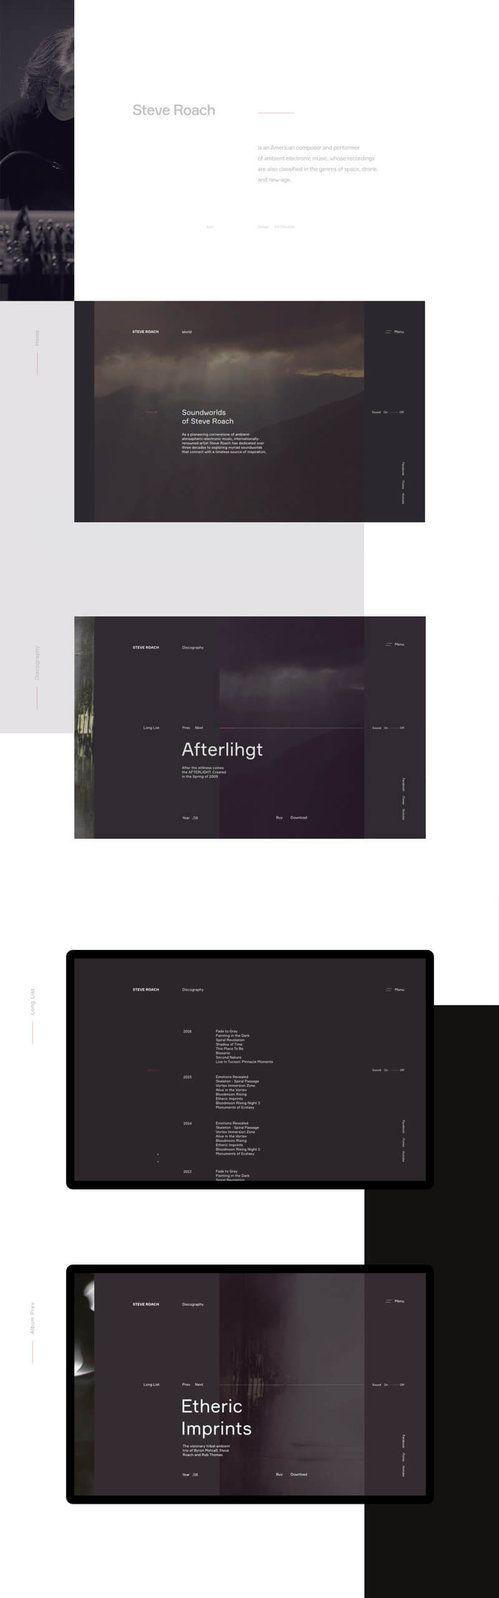 Steve-Roach1 #ui #ux#userexperience #website #webdesign #design